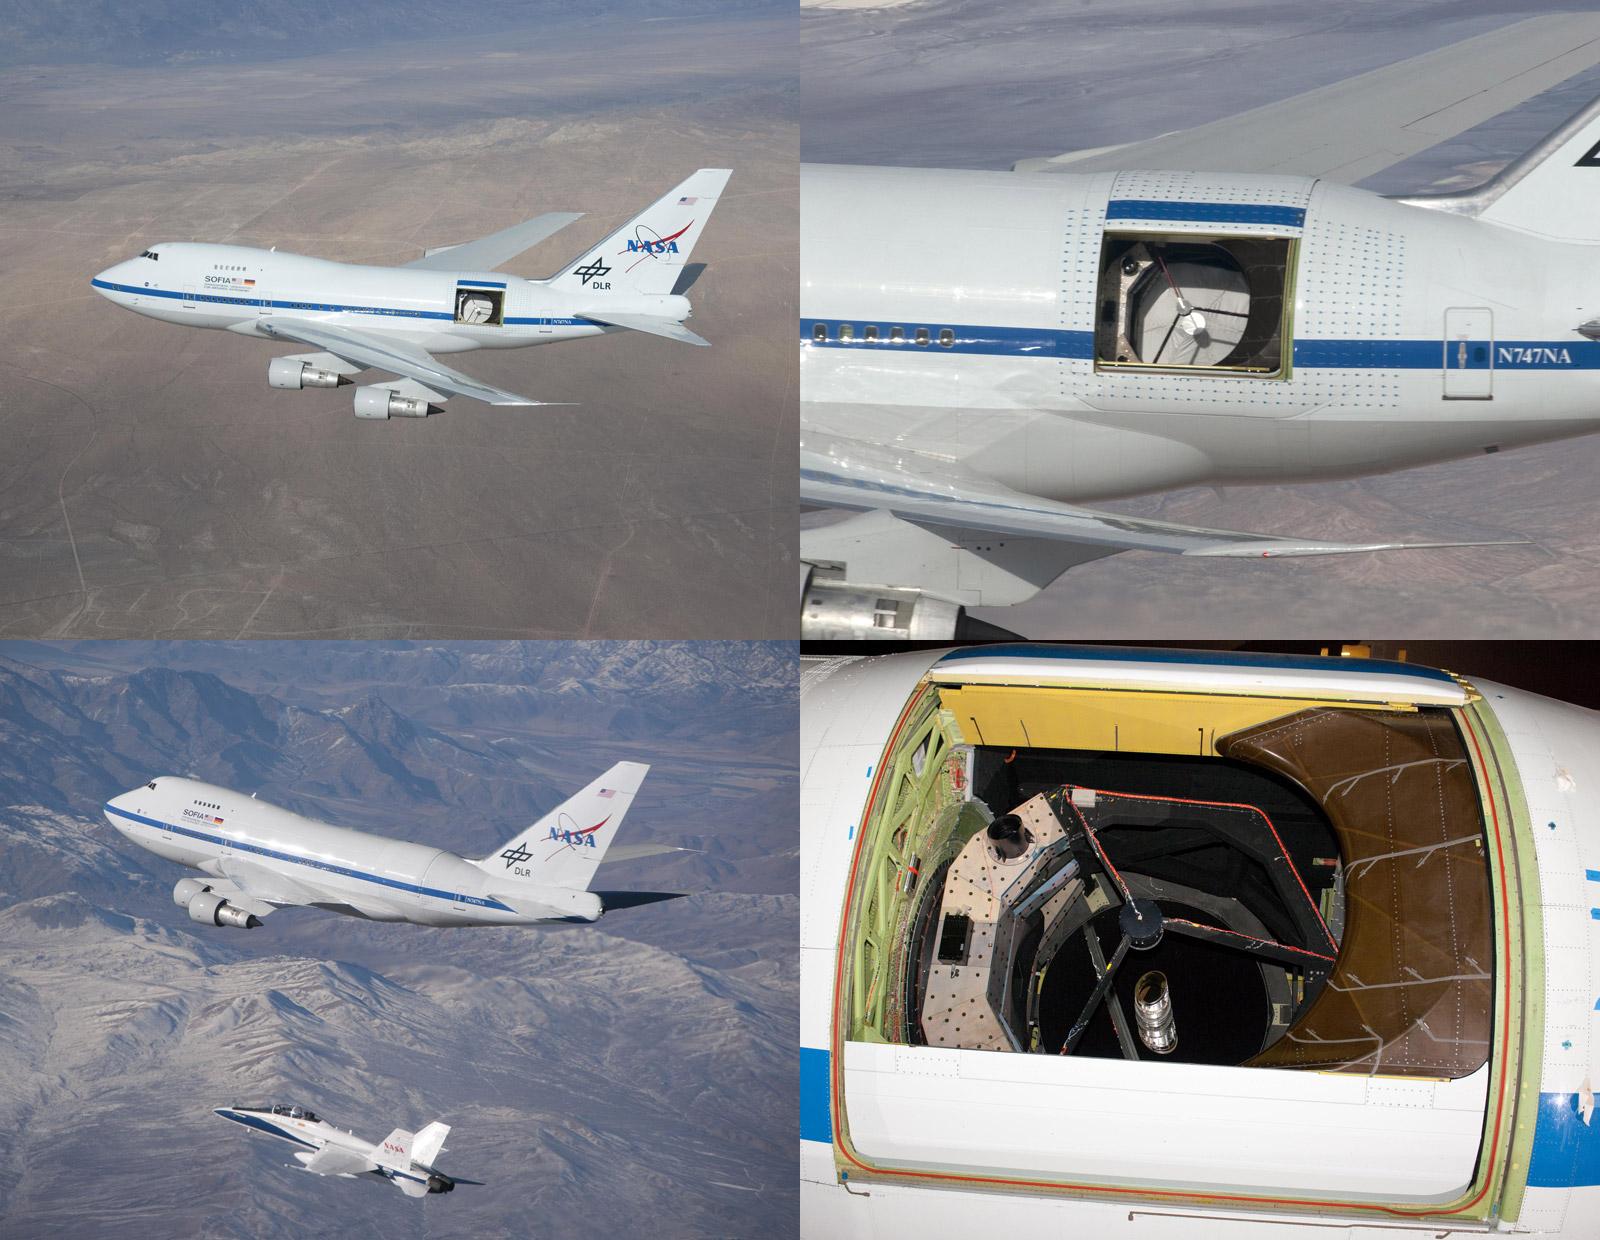 NASA Sofia 747 (page 4) - Pics about space